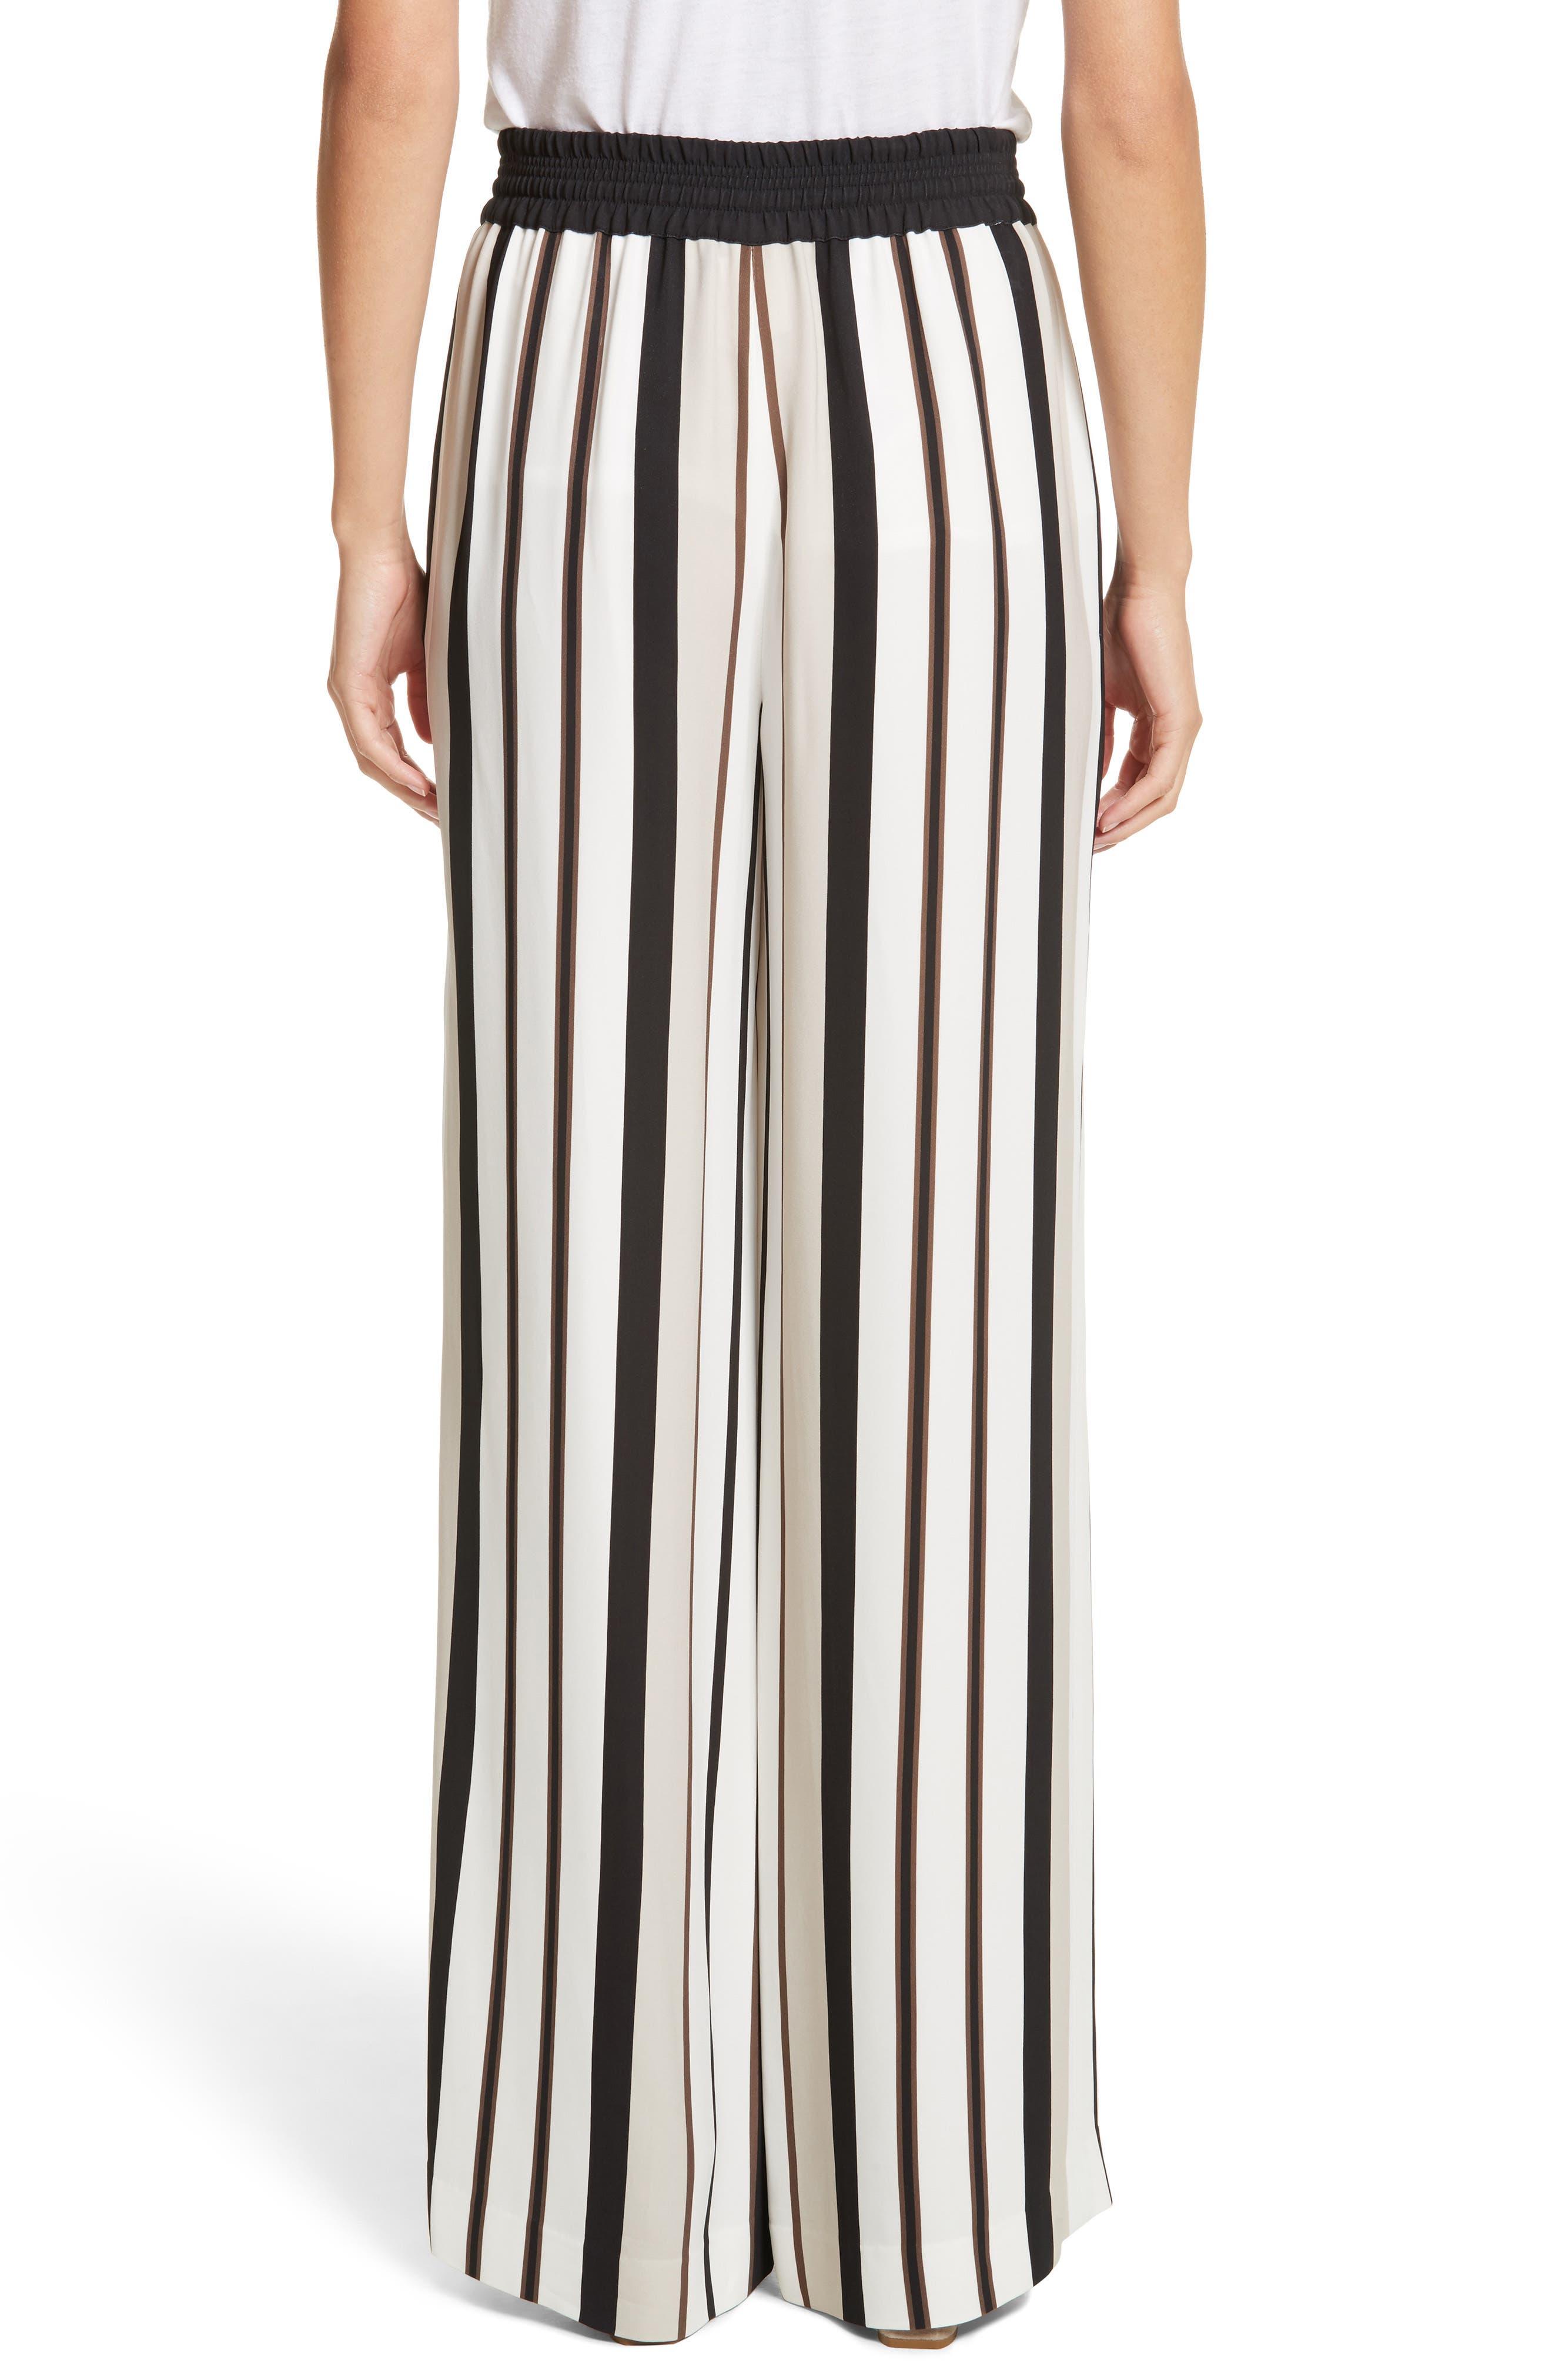 Allen Legacy Stripe Drape Cloth Pants,                             Alternate thumbnail 2, color,                             Black Multi